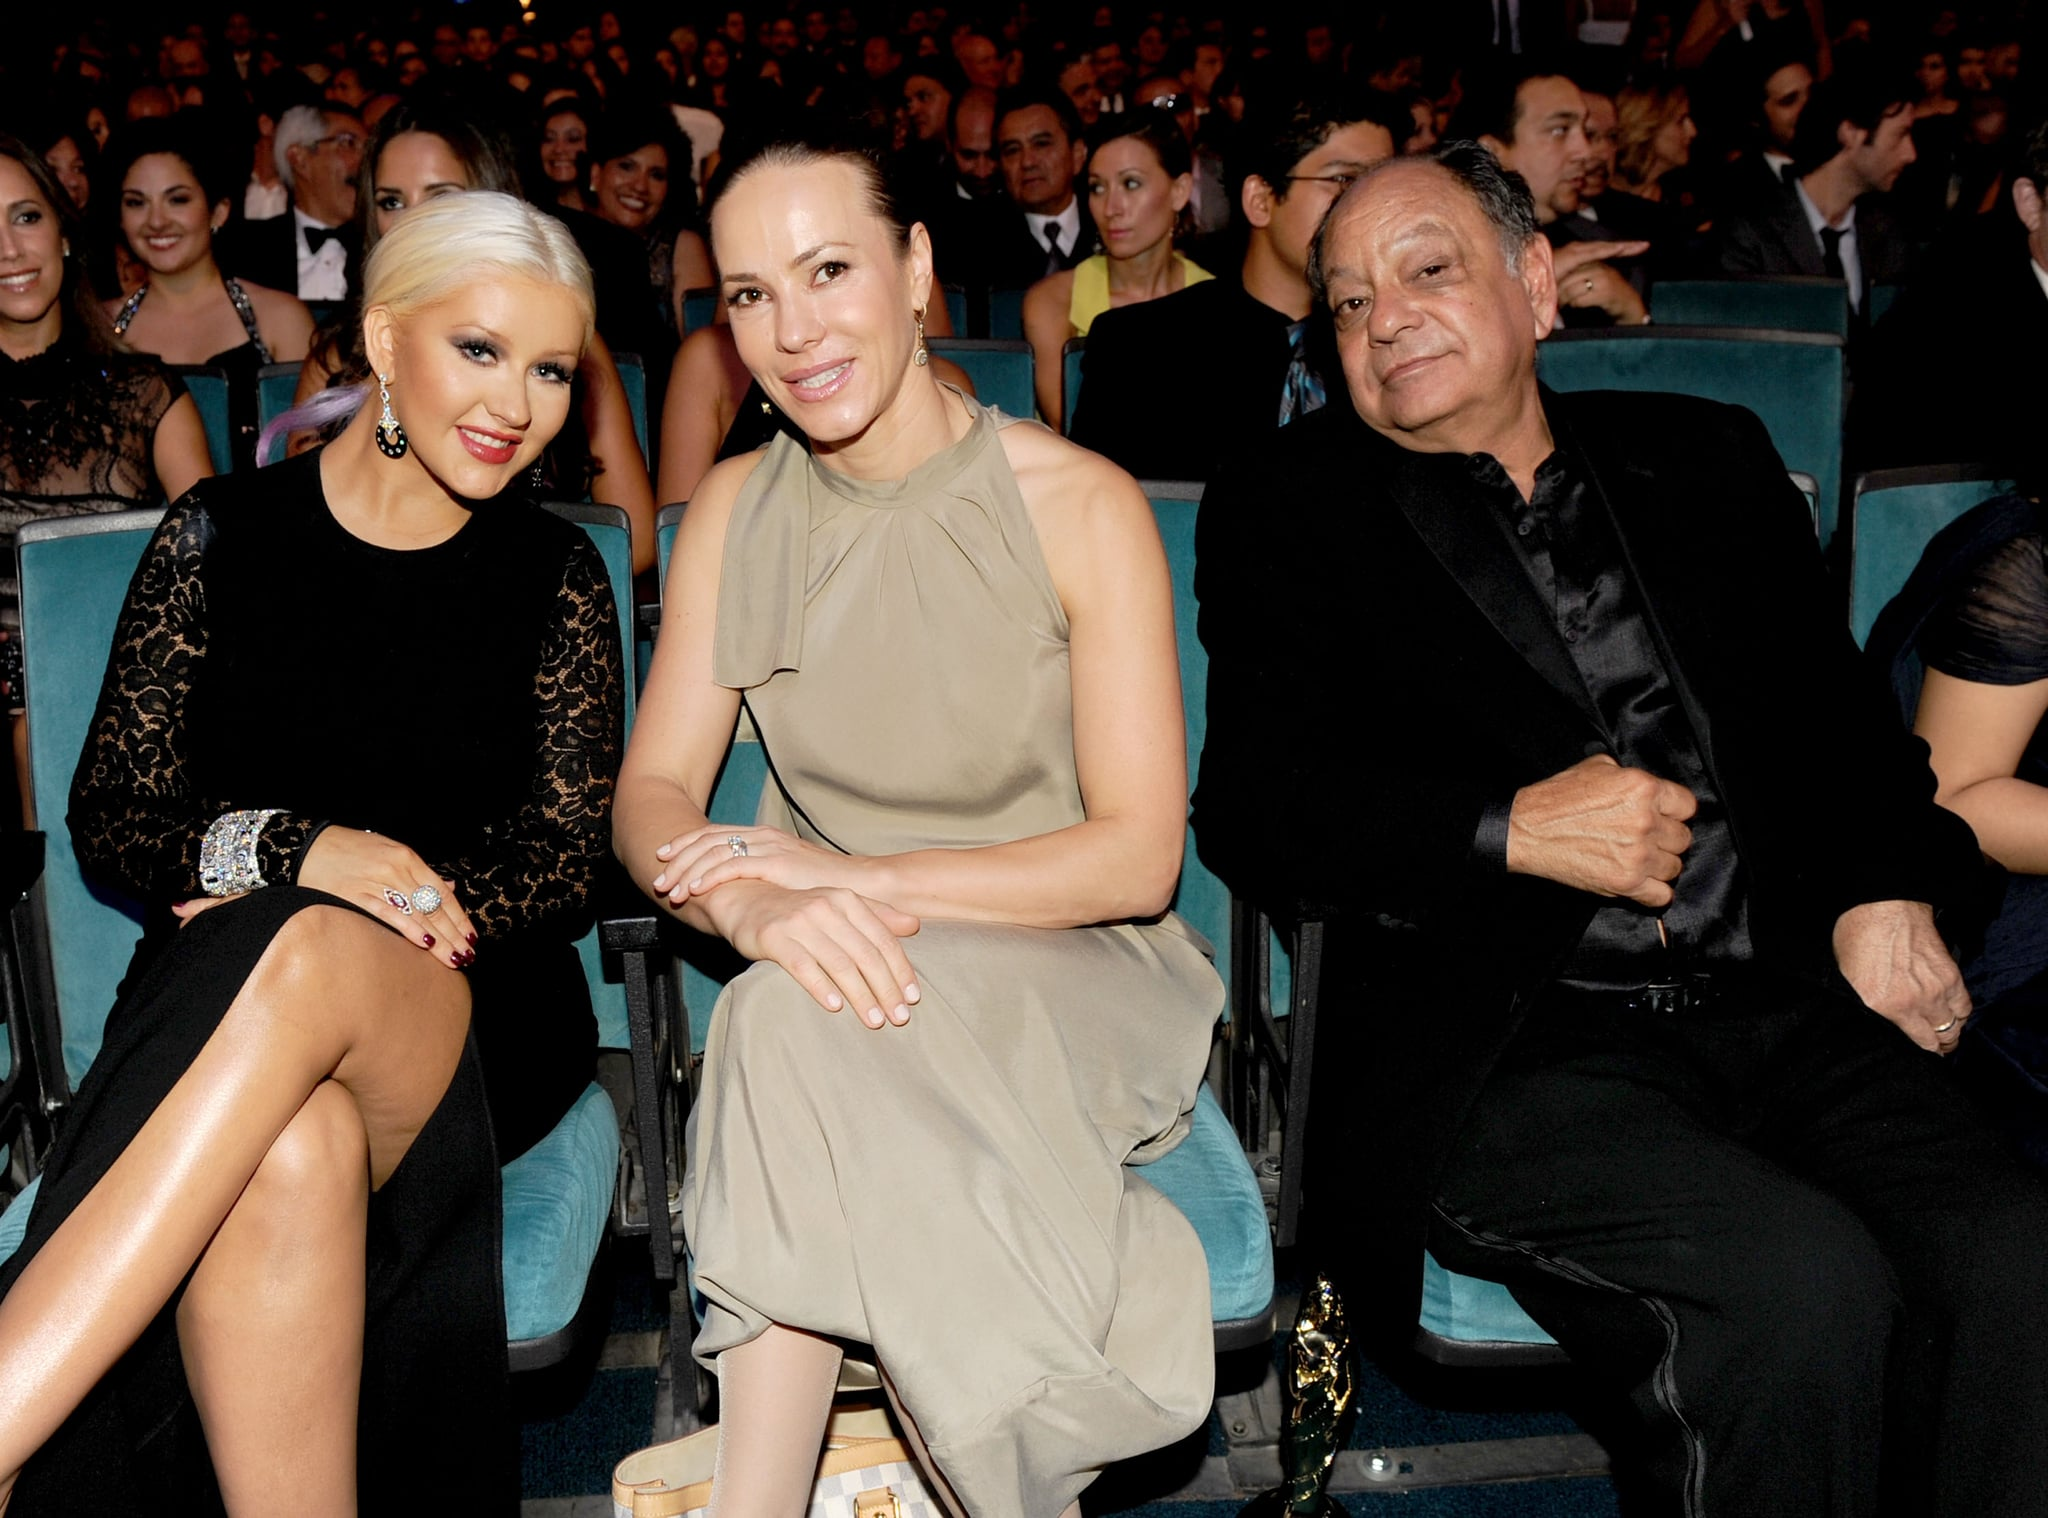 Christina Aguilera was seated next to Natasha Marin and Cheech Marin for the ALMA Awards in LA.